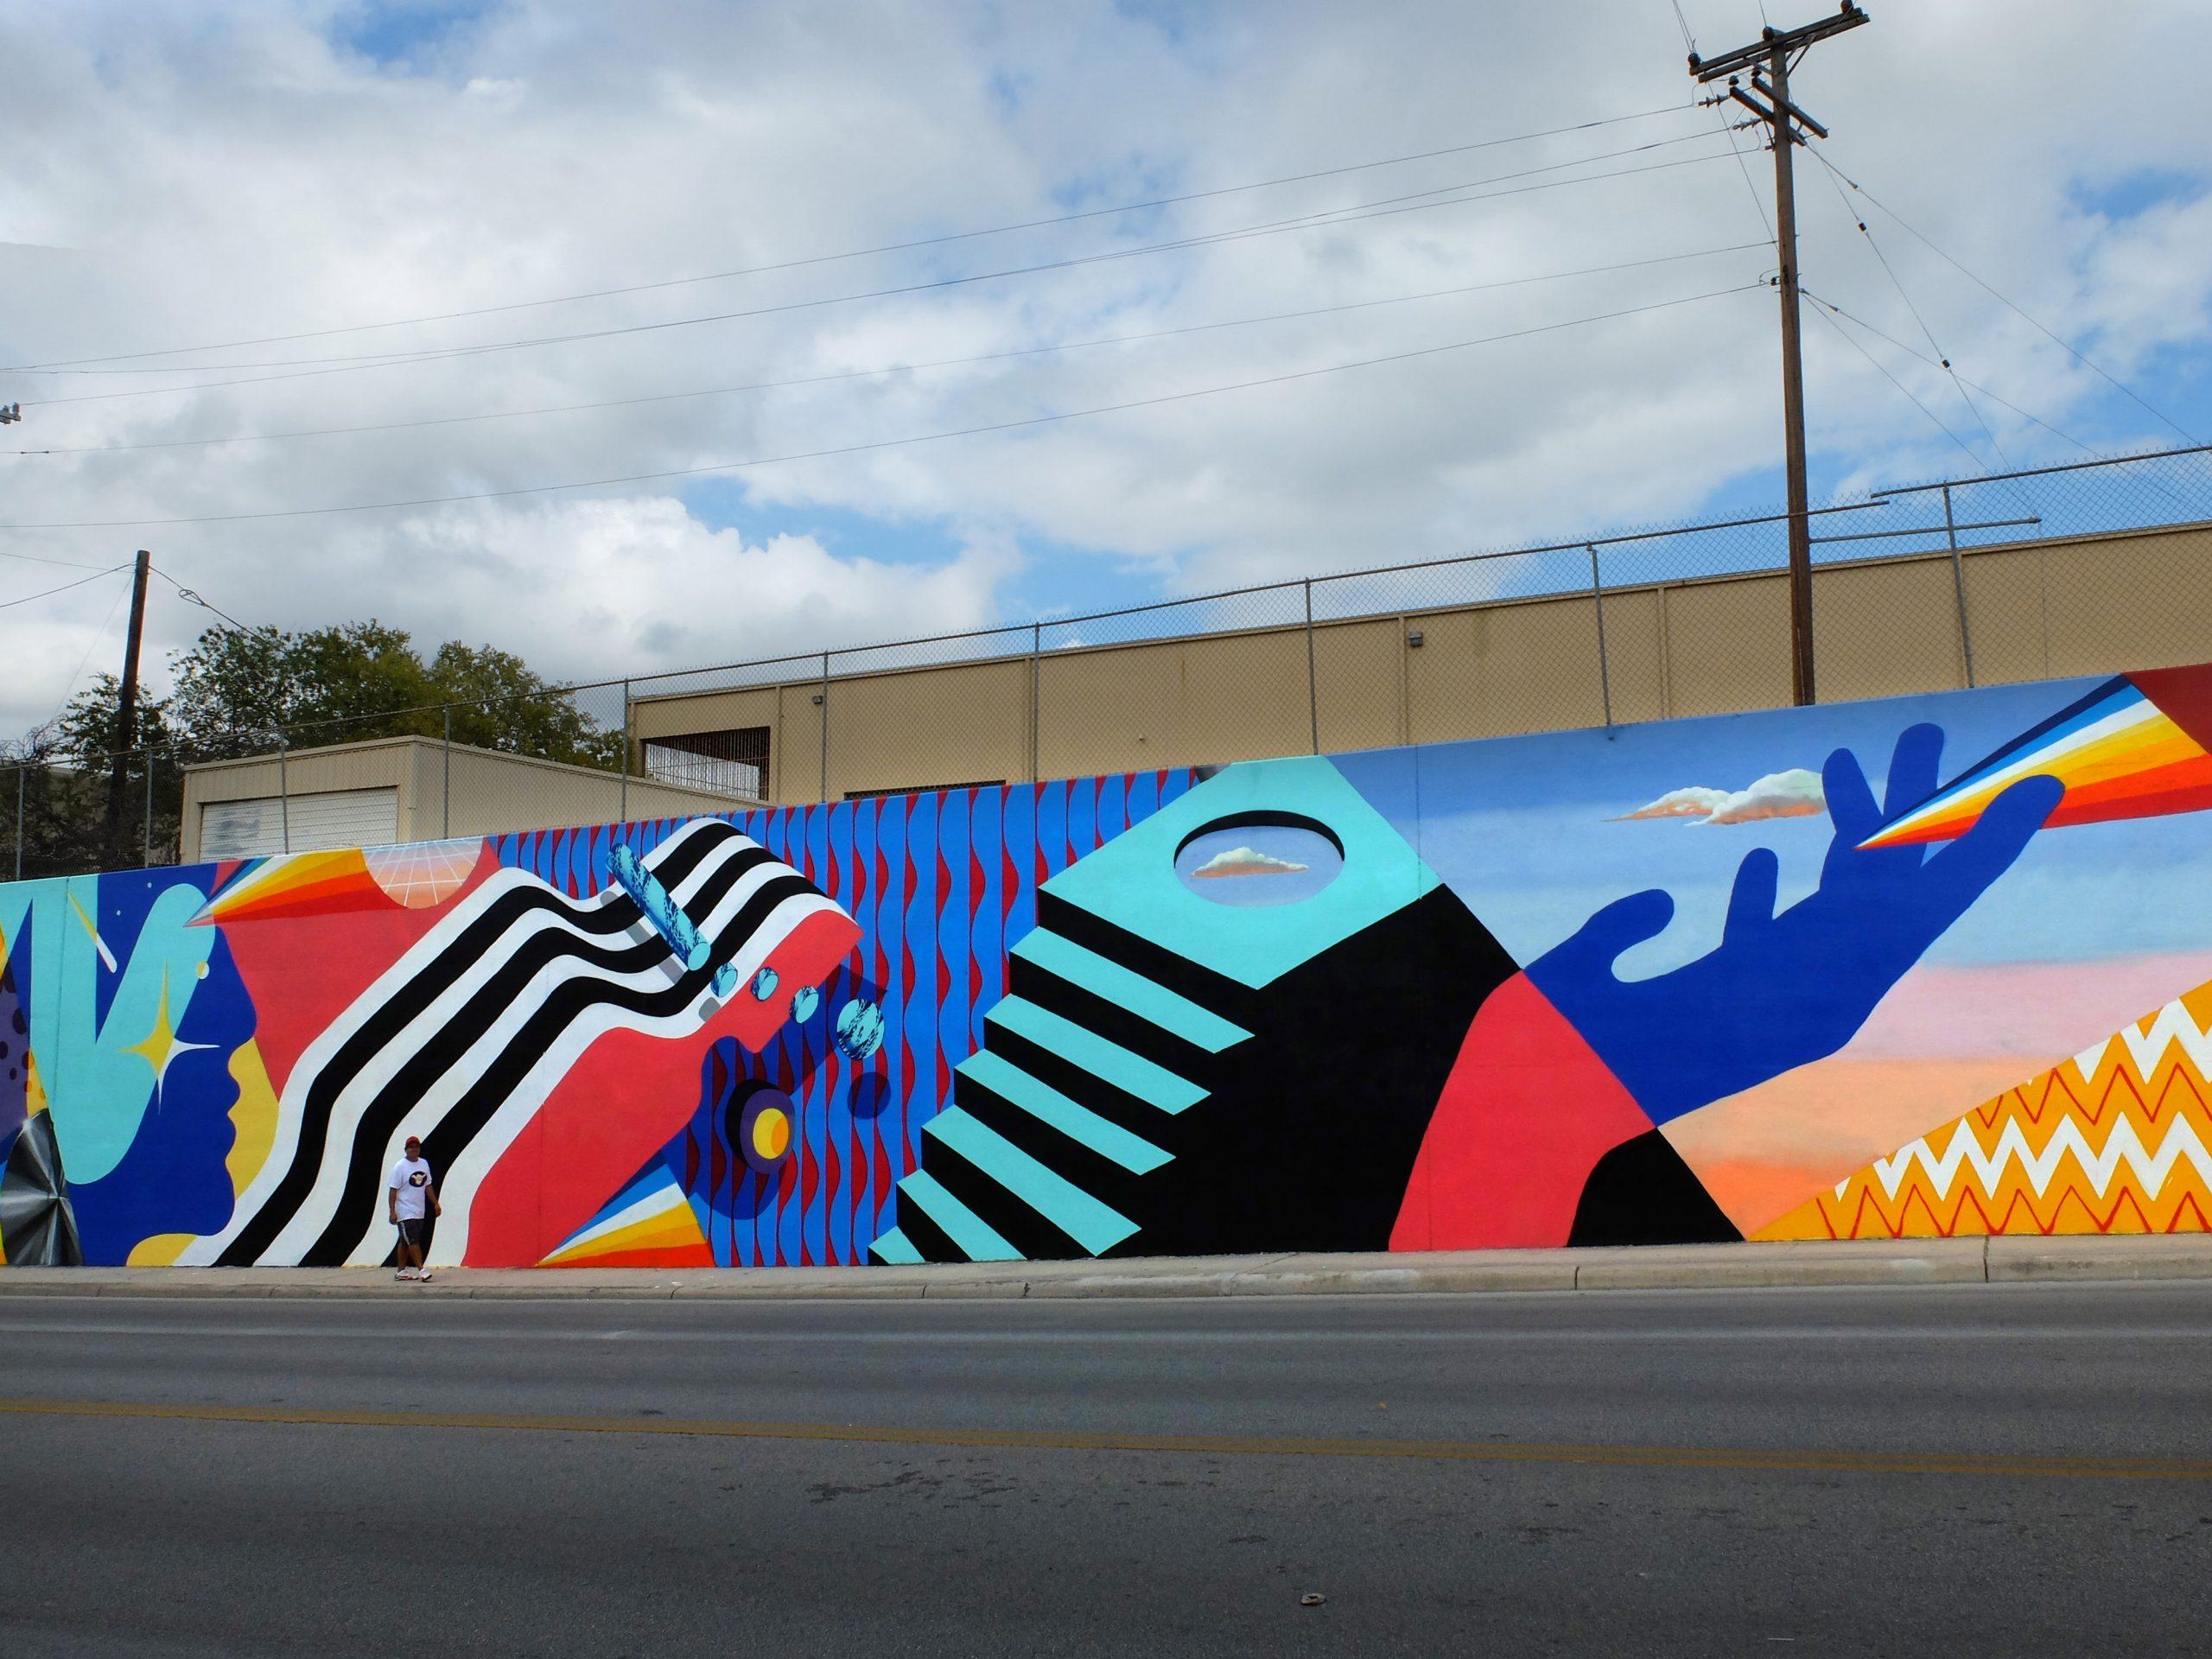 San Antonio, Texas, 2016. Luminaria Contemporary Arts Festival - Murone